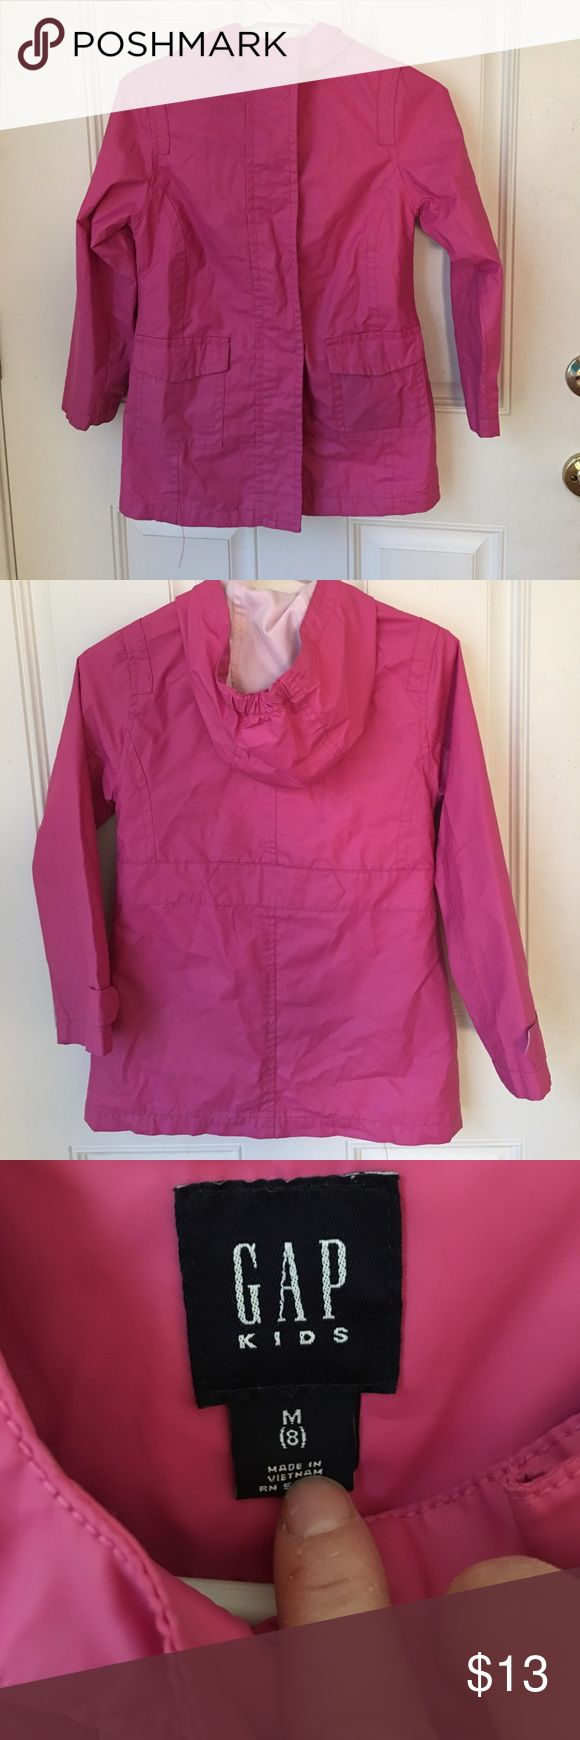 Gap girls pink raincoat 8 Cute girls raincoat from Gap. Girls size 8. #2/20/17. GAP Jackets & Coats Raincoats